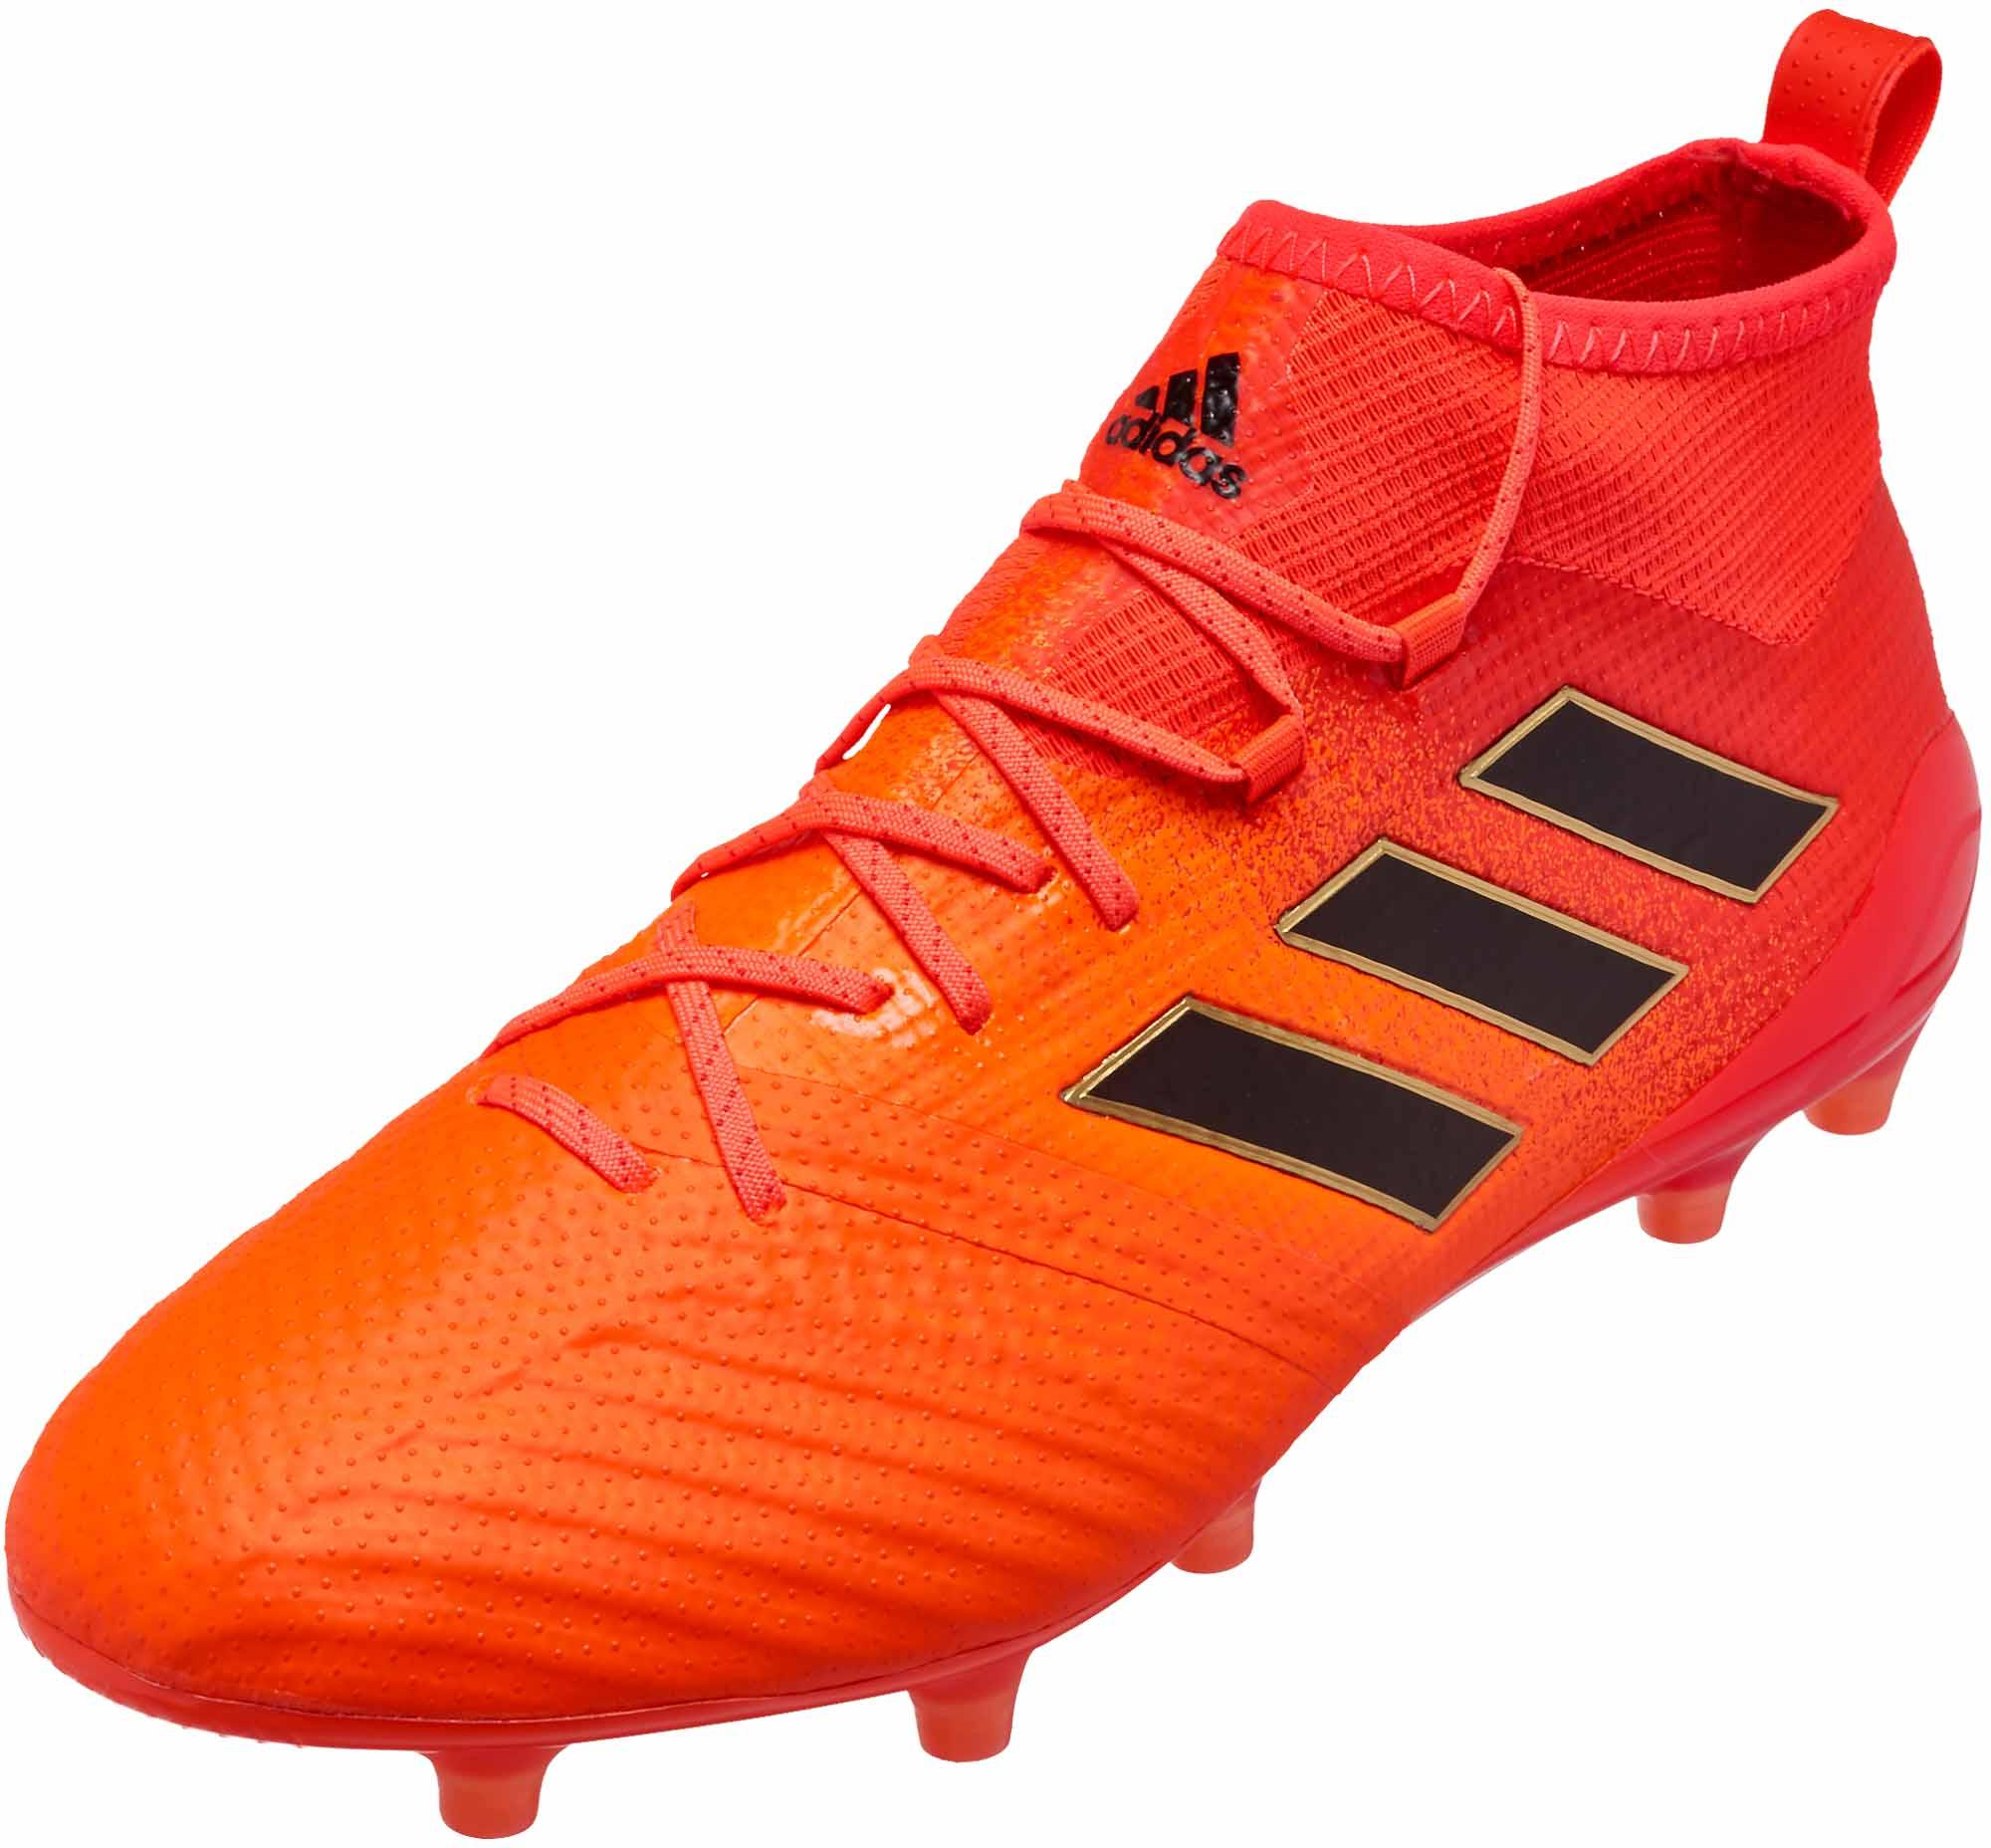 adidas ACE 17.1 FG Soccer Cleats